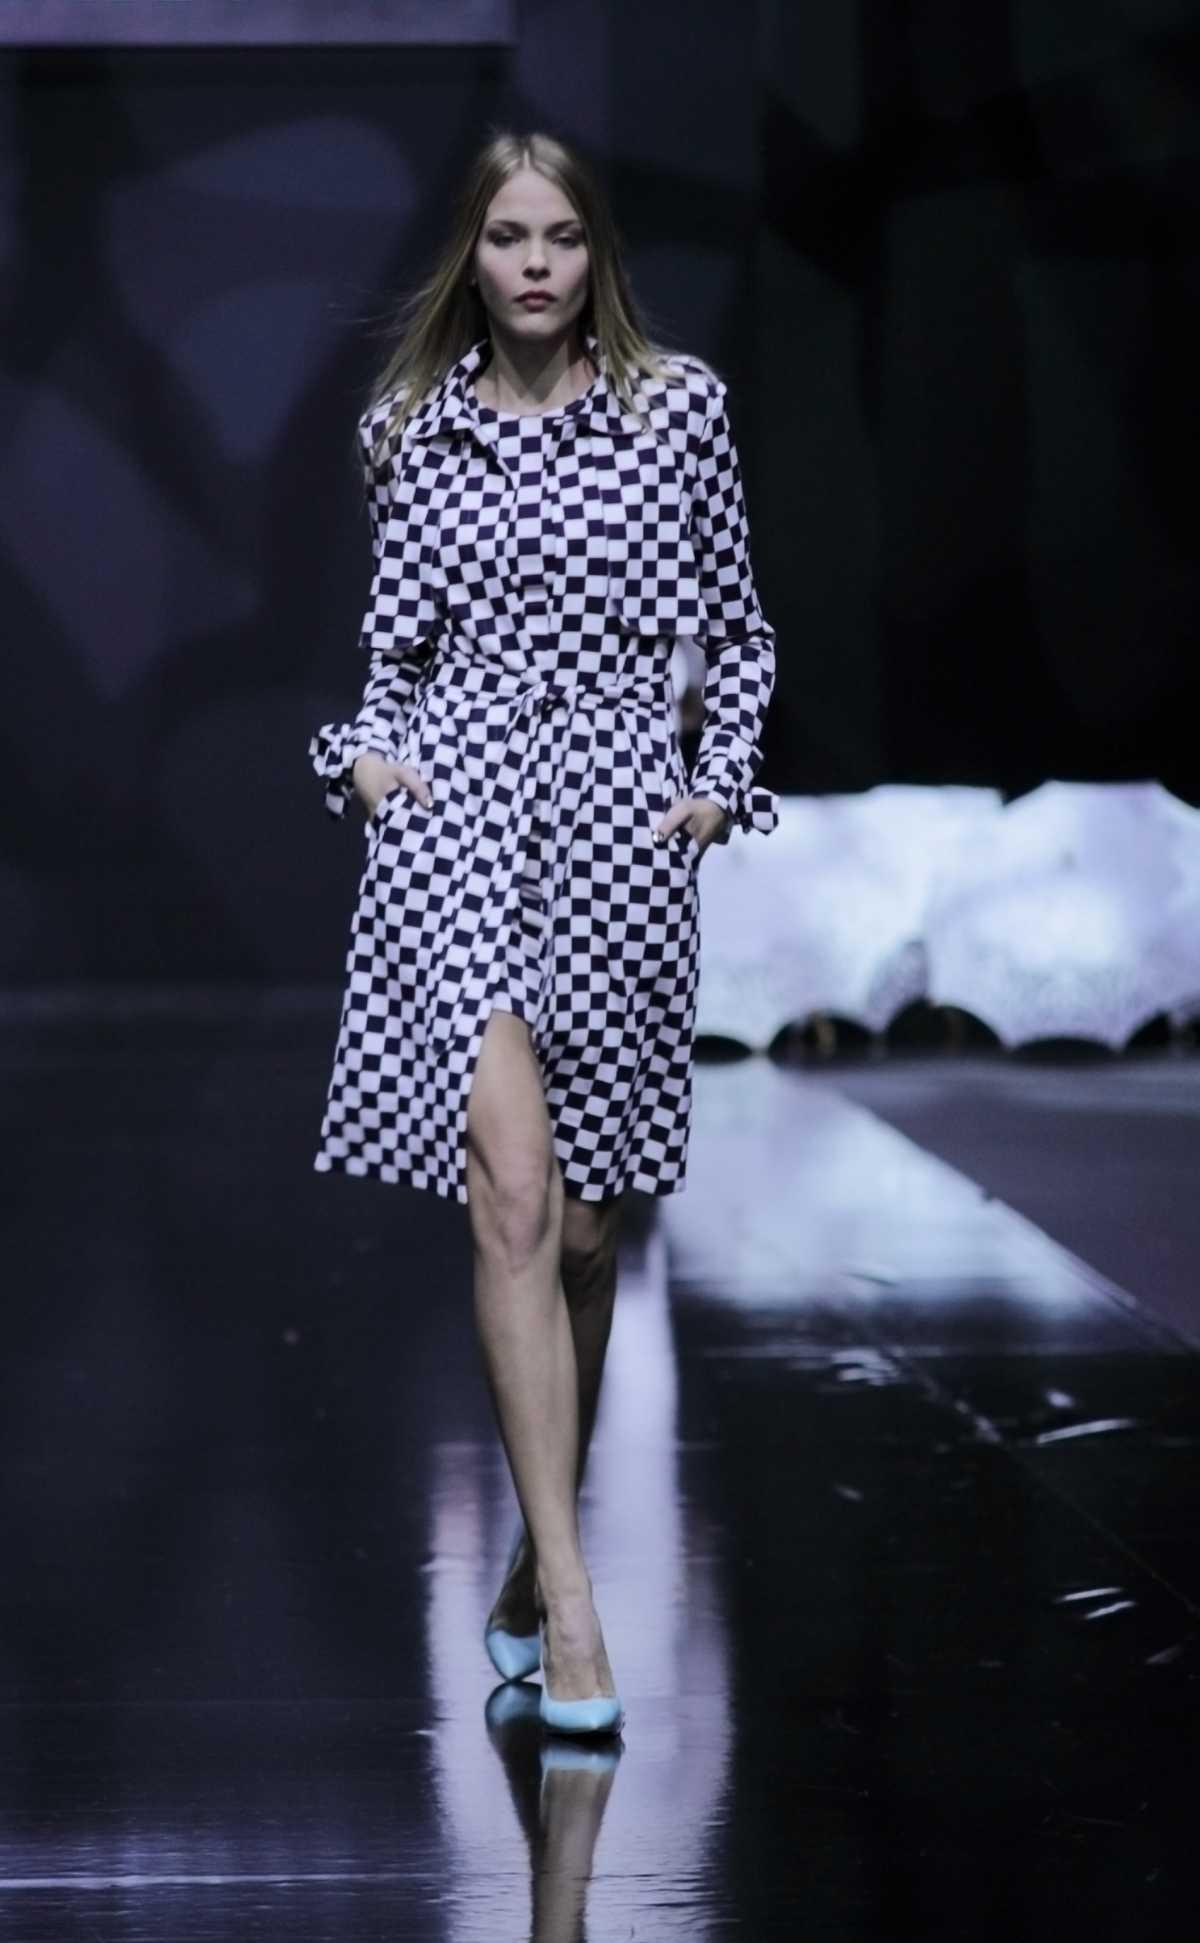 vestido com estampa xadrez vichy é tendência